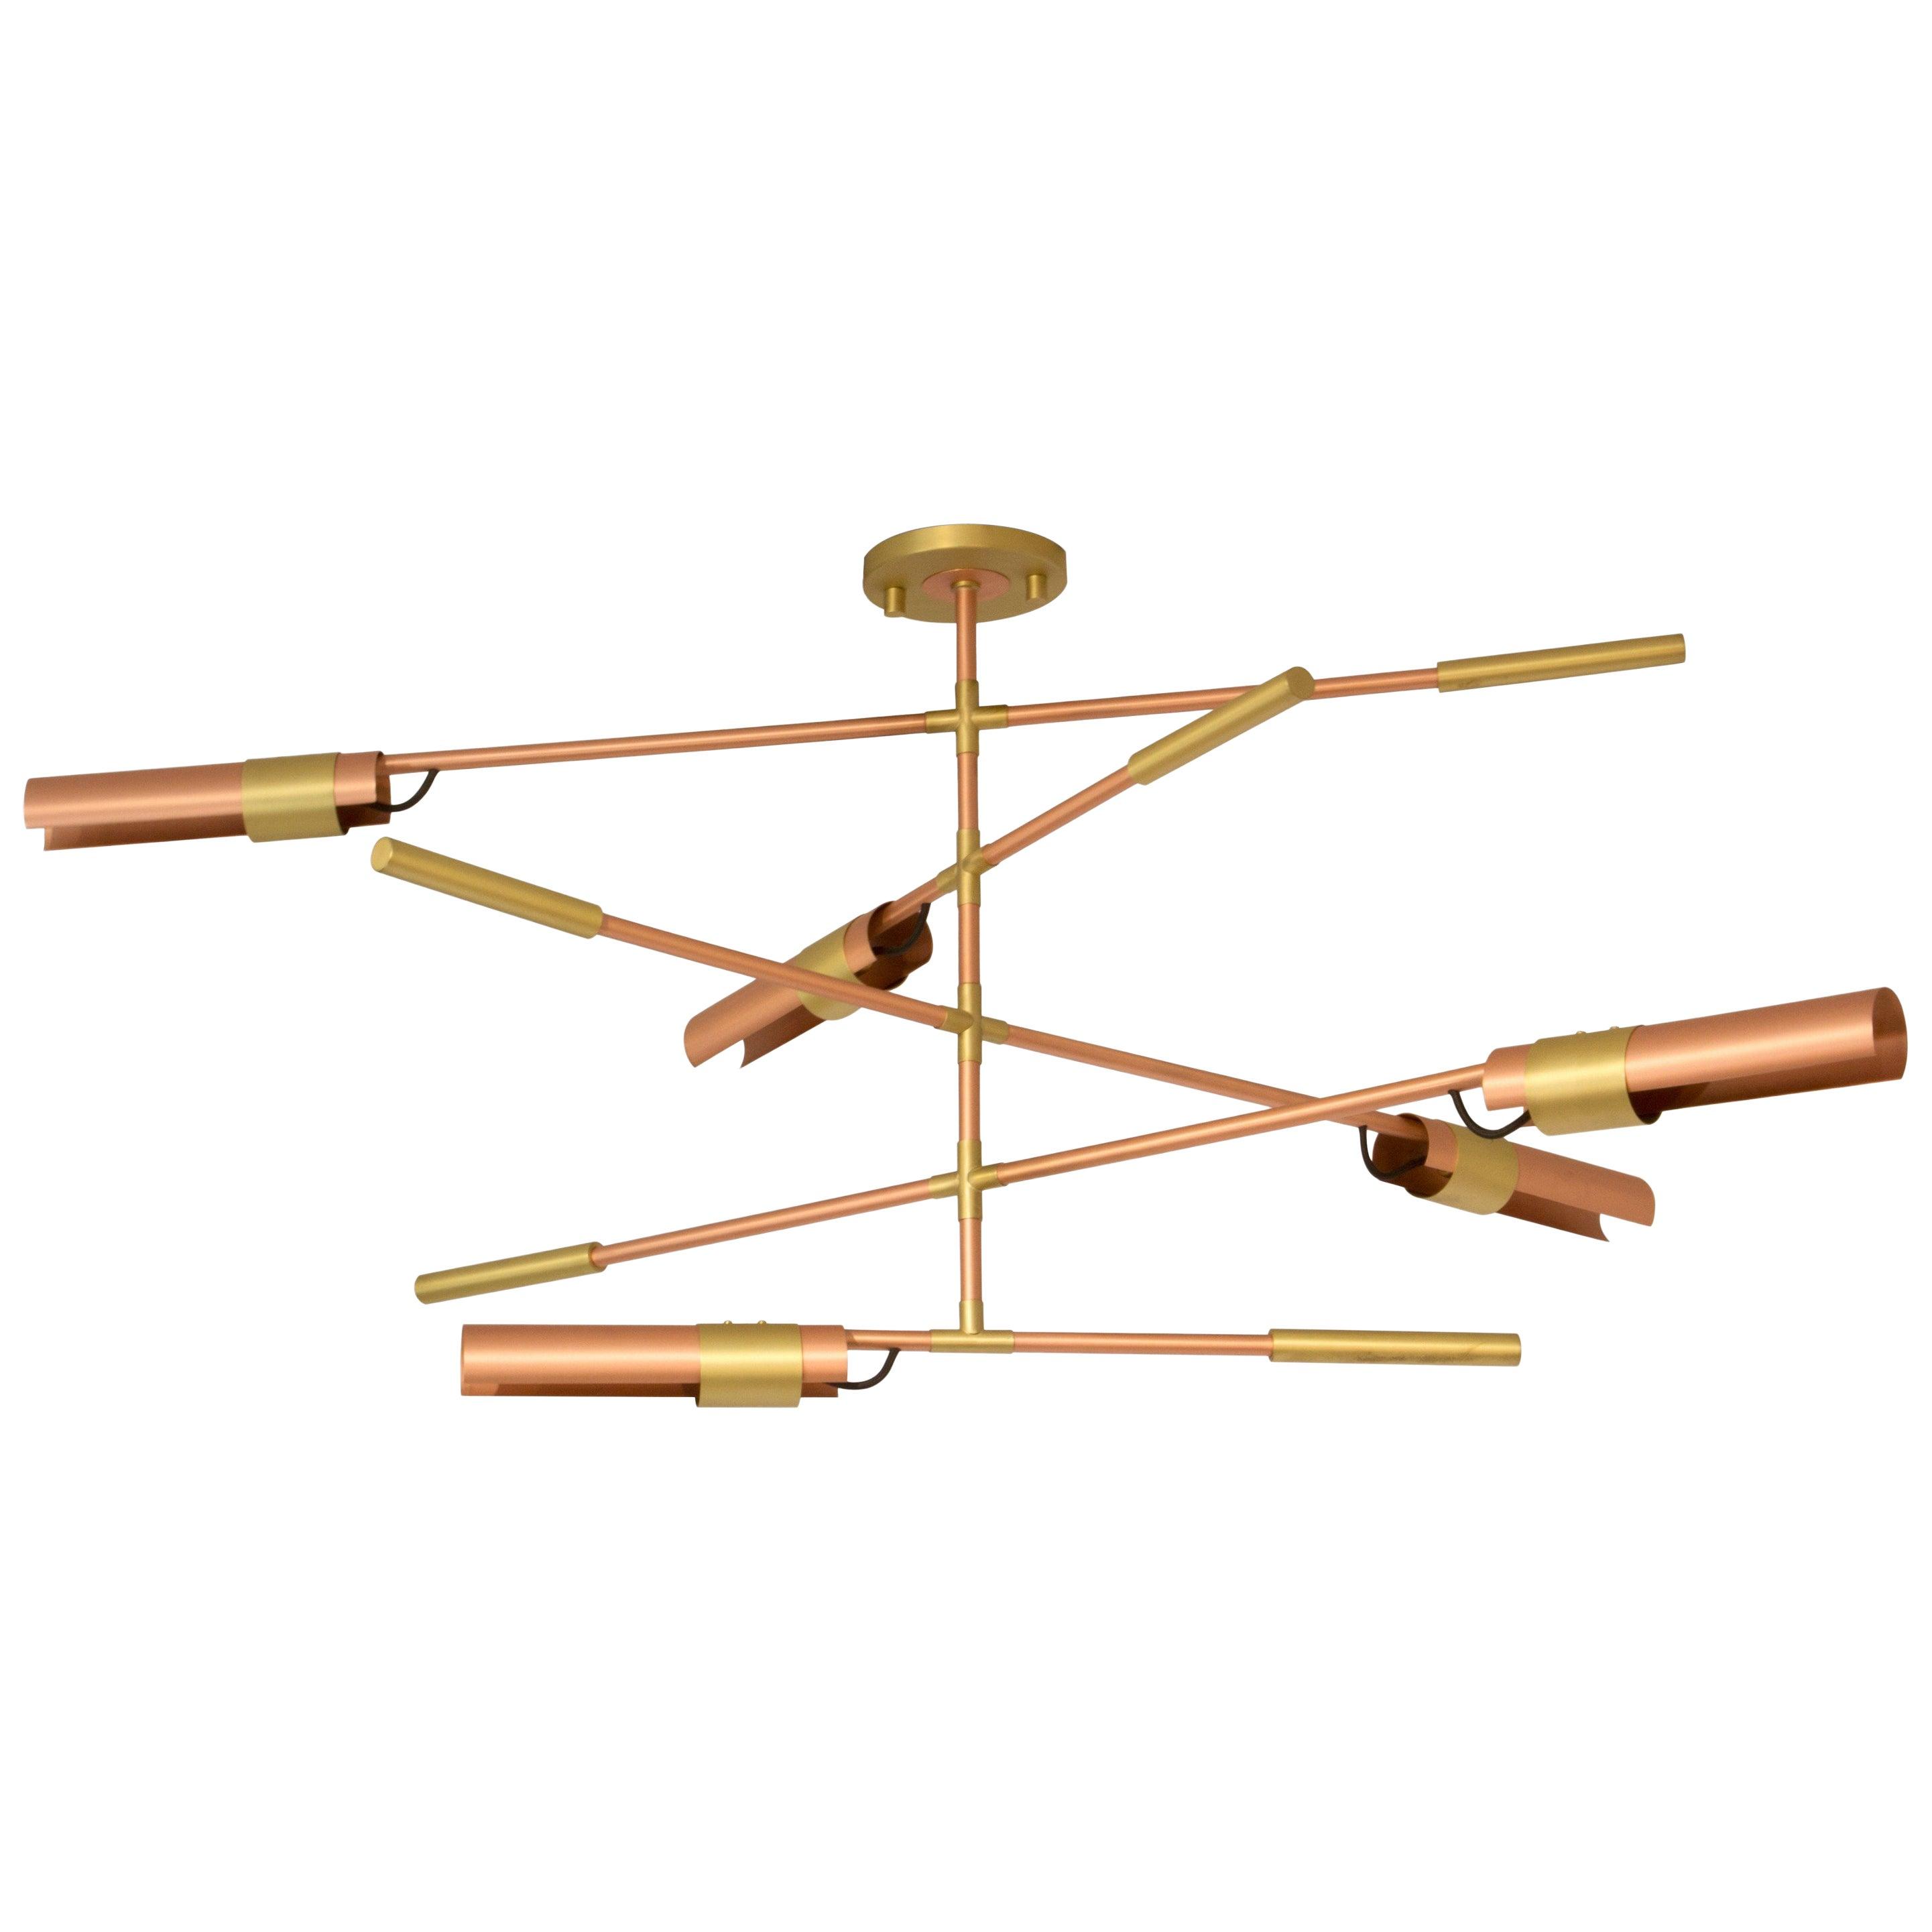 Koben Chandelier in Brushed Copper and Brass